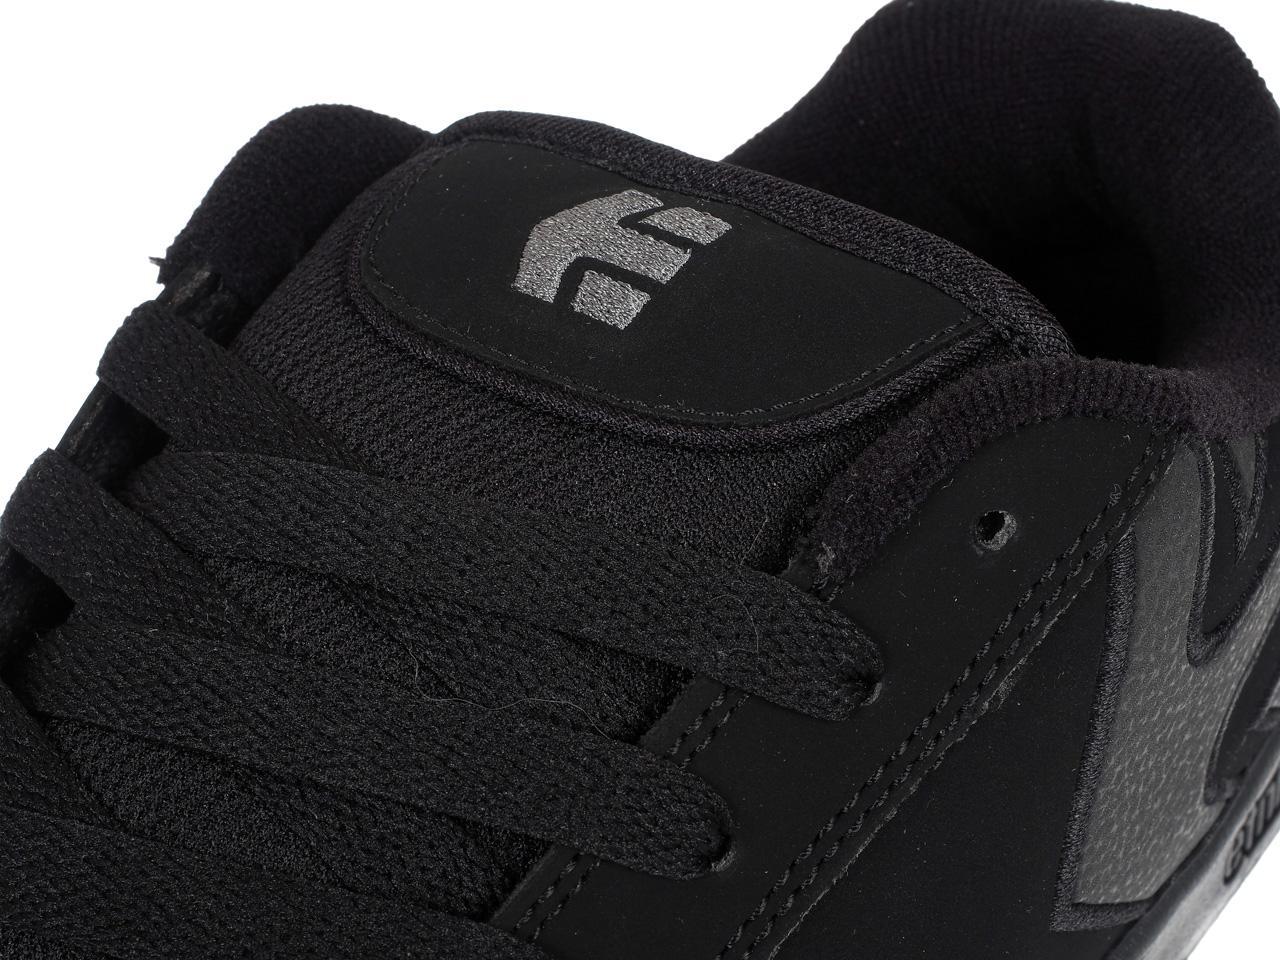 Shoes-Skateboard-Etnies-Fader-Black-Dirty-Wash-Black-42823-New thumbnail 2